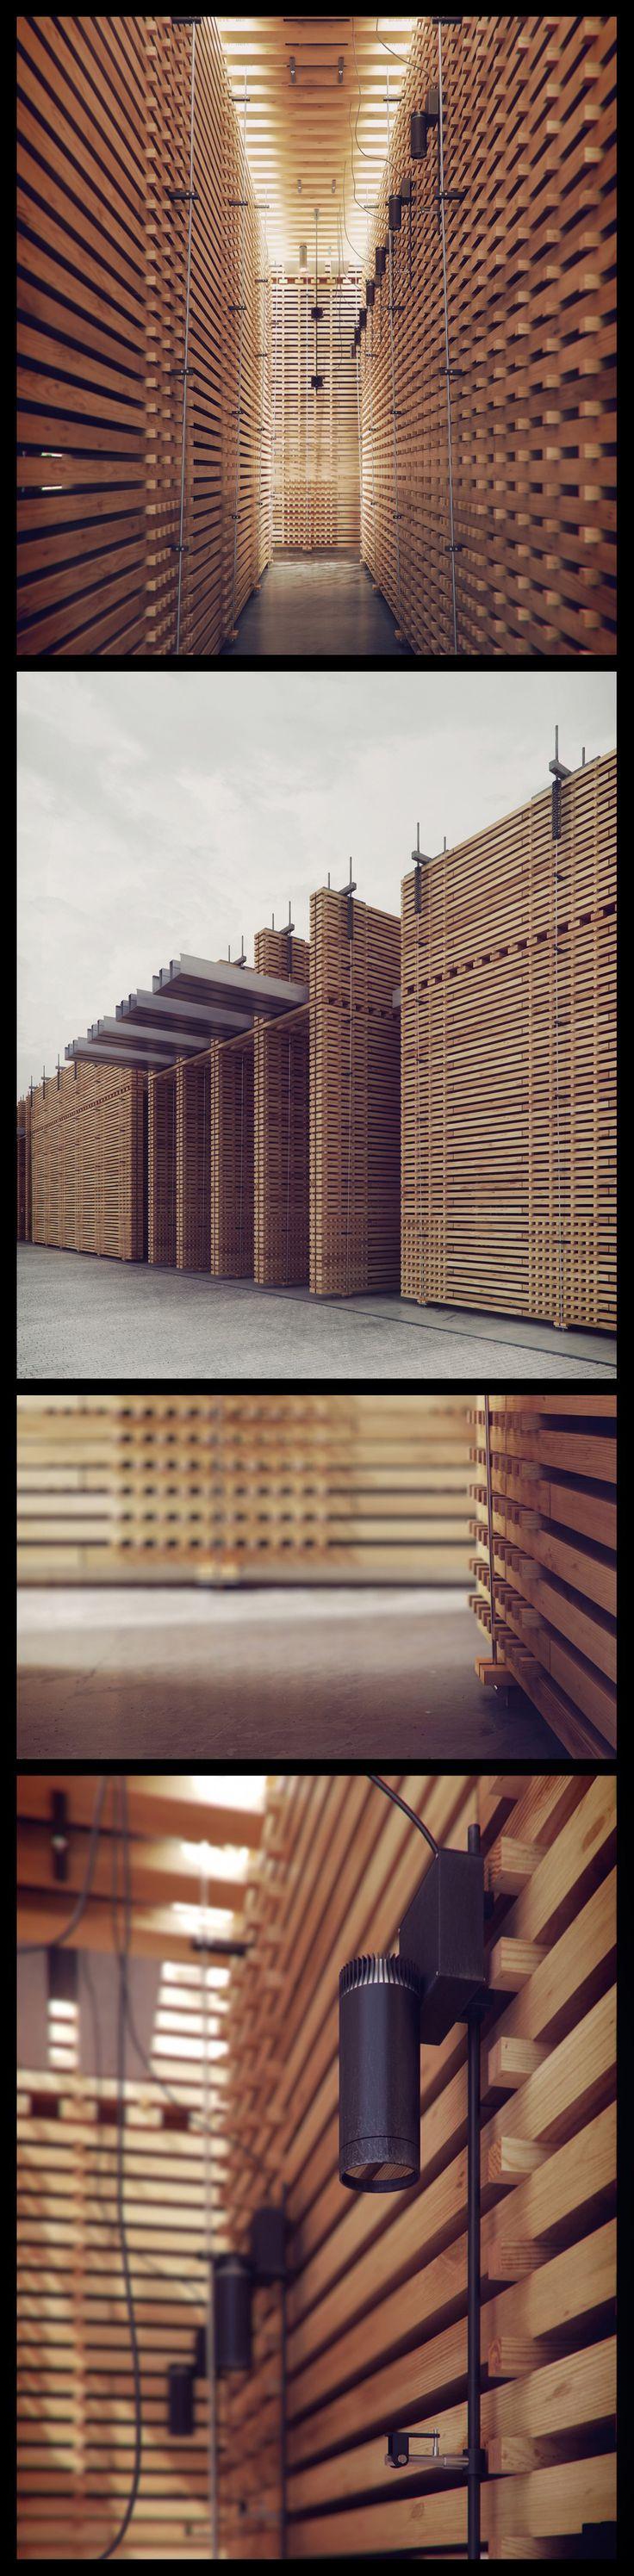 Swiss Pavillion / Peter Zumtor